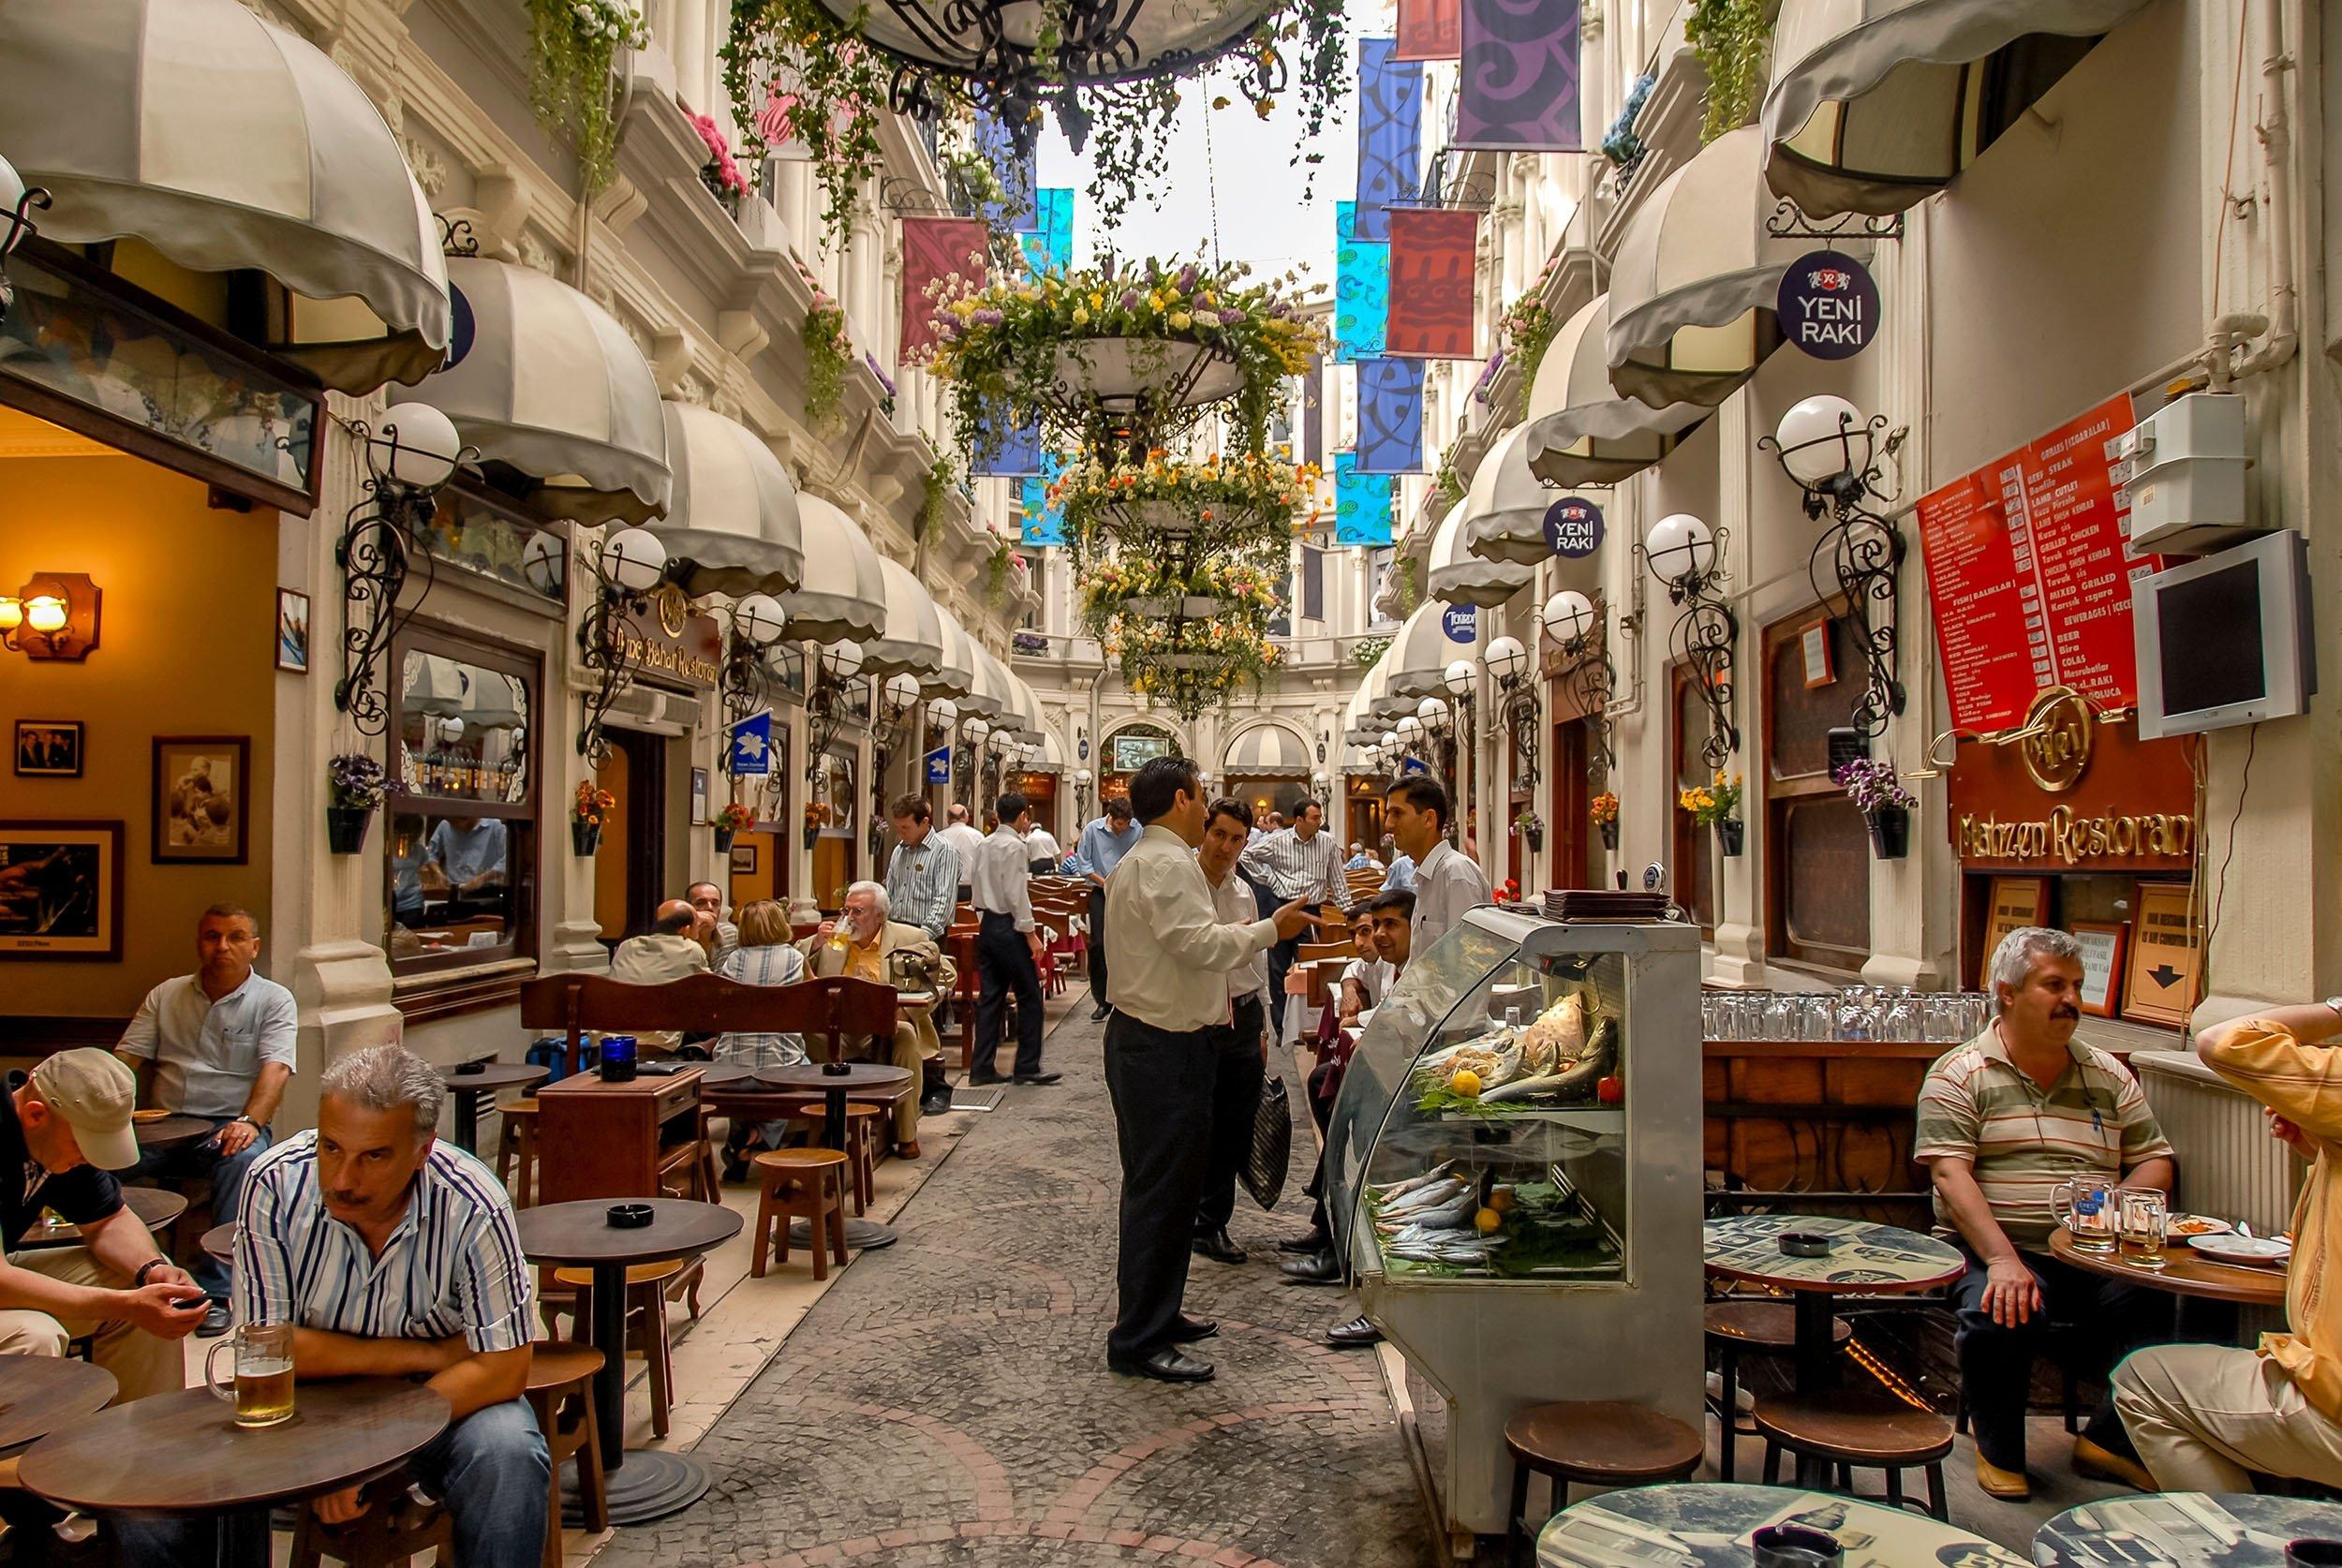 Çiçek Pasajı, or Cite de Pera,a famous historic passage on Istiklal Avenue in the Beyoğlu district,Istanbul, Turkey. (Shutterstock Photo)